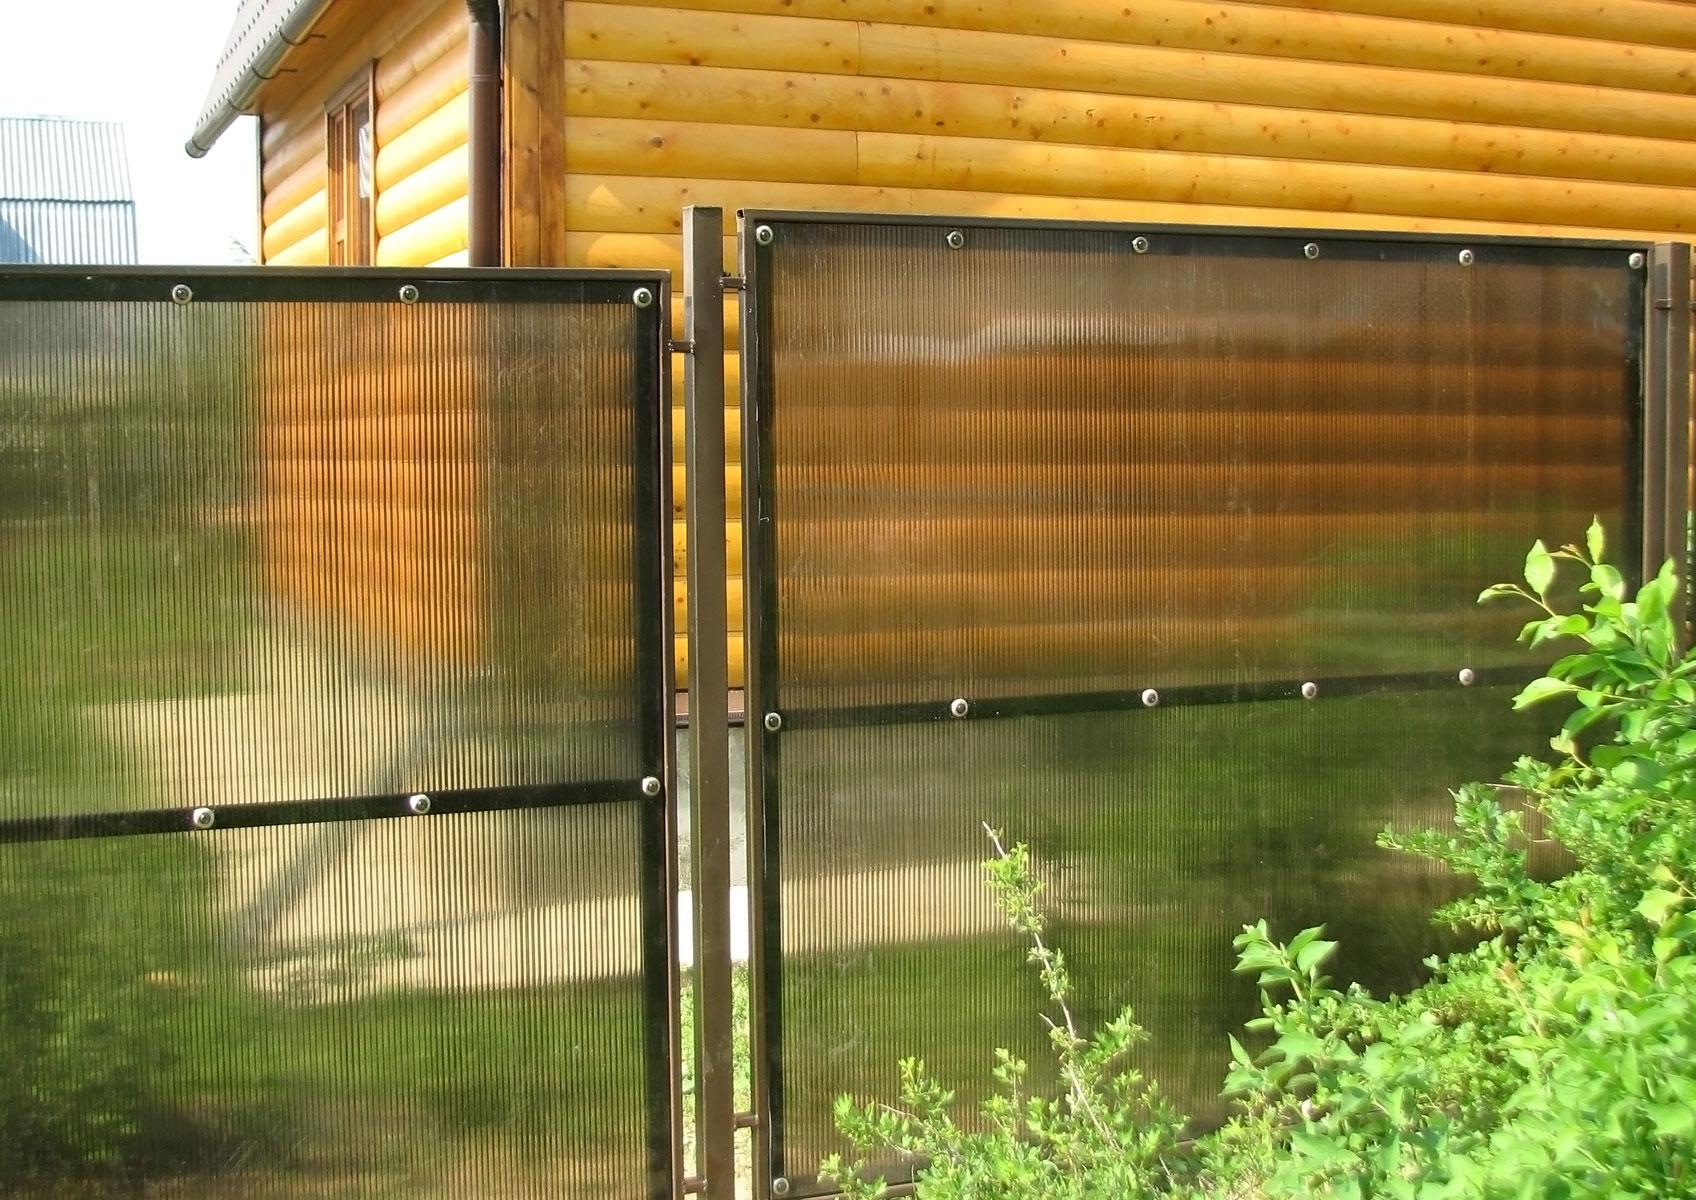 забор из поликарбоната дизайн идеи